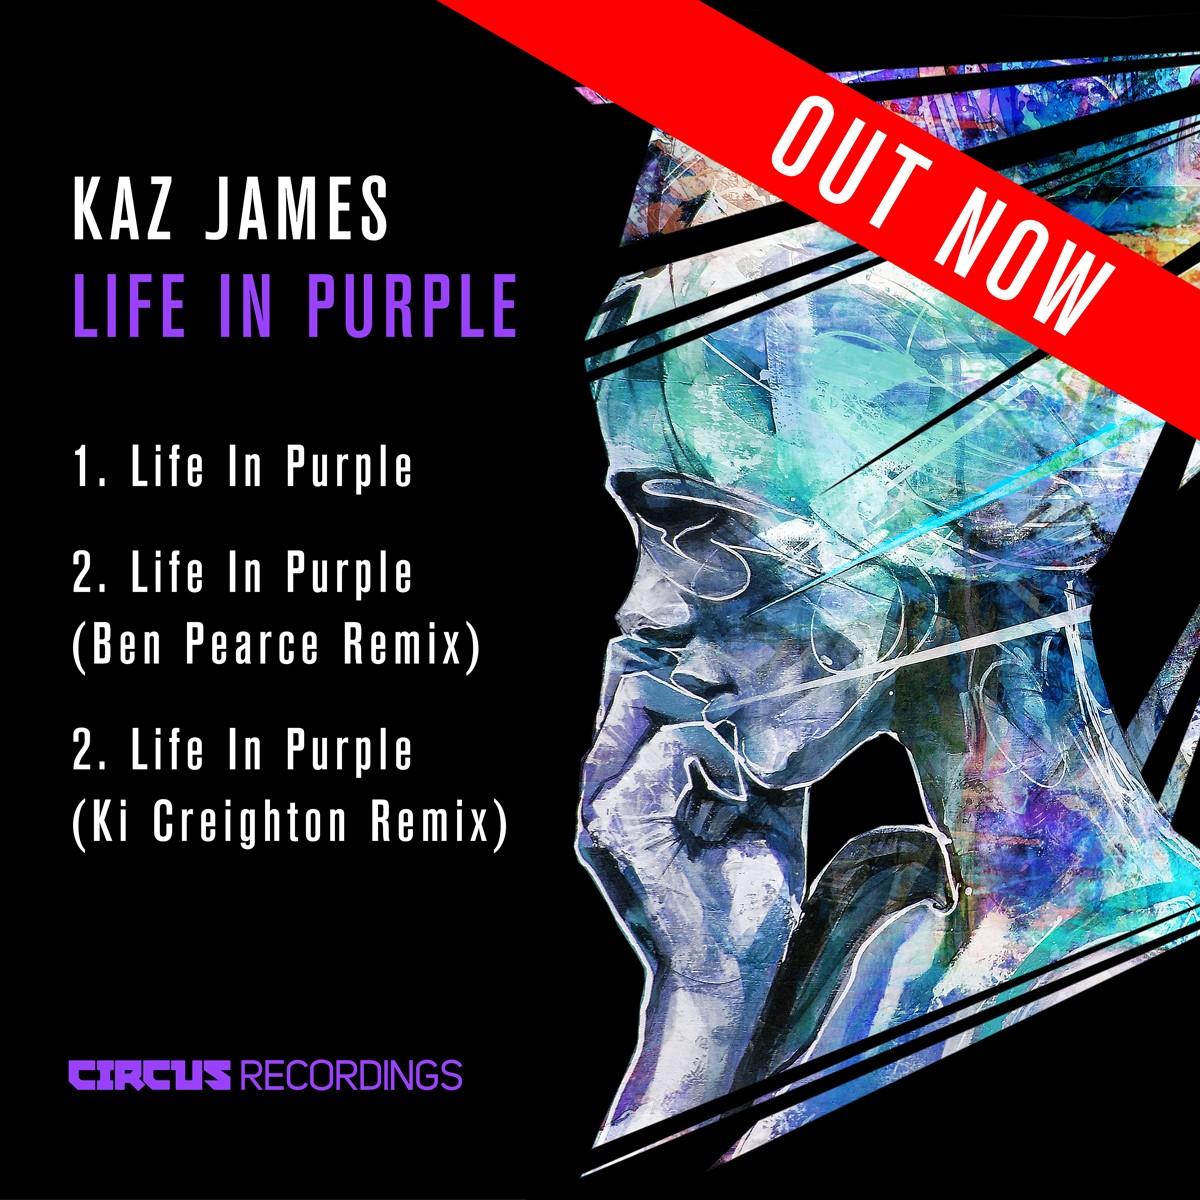 Kaz James - Life In Purple